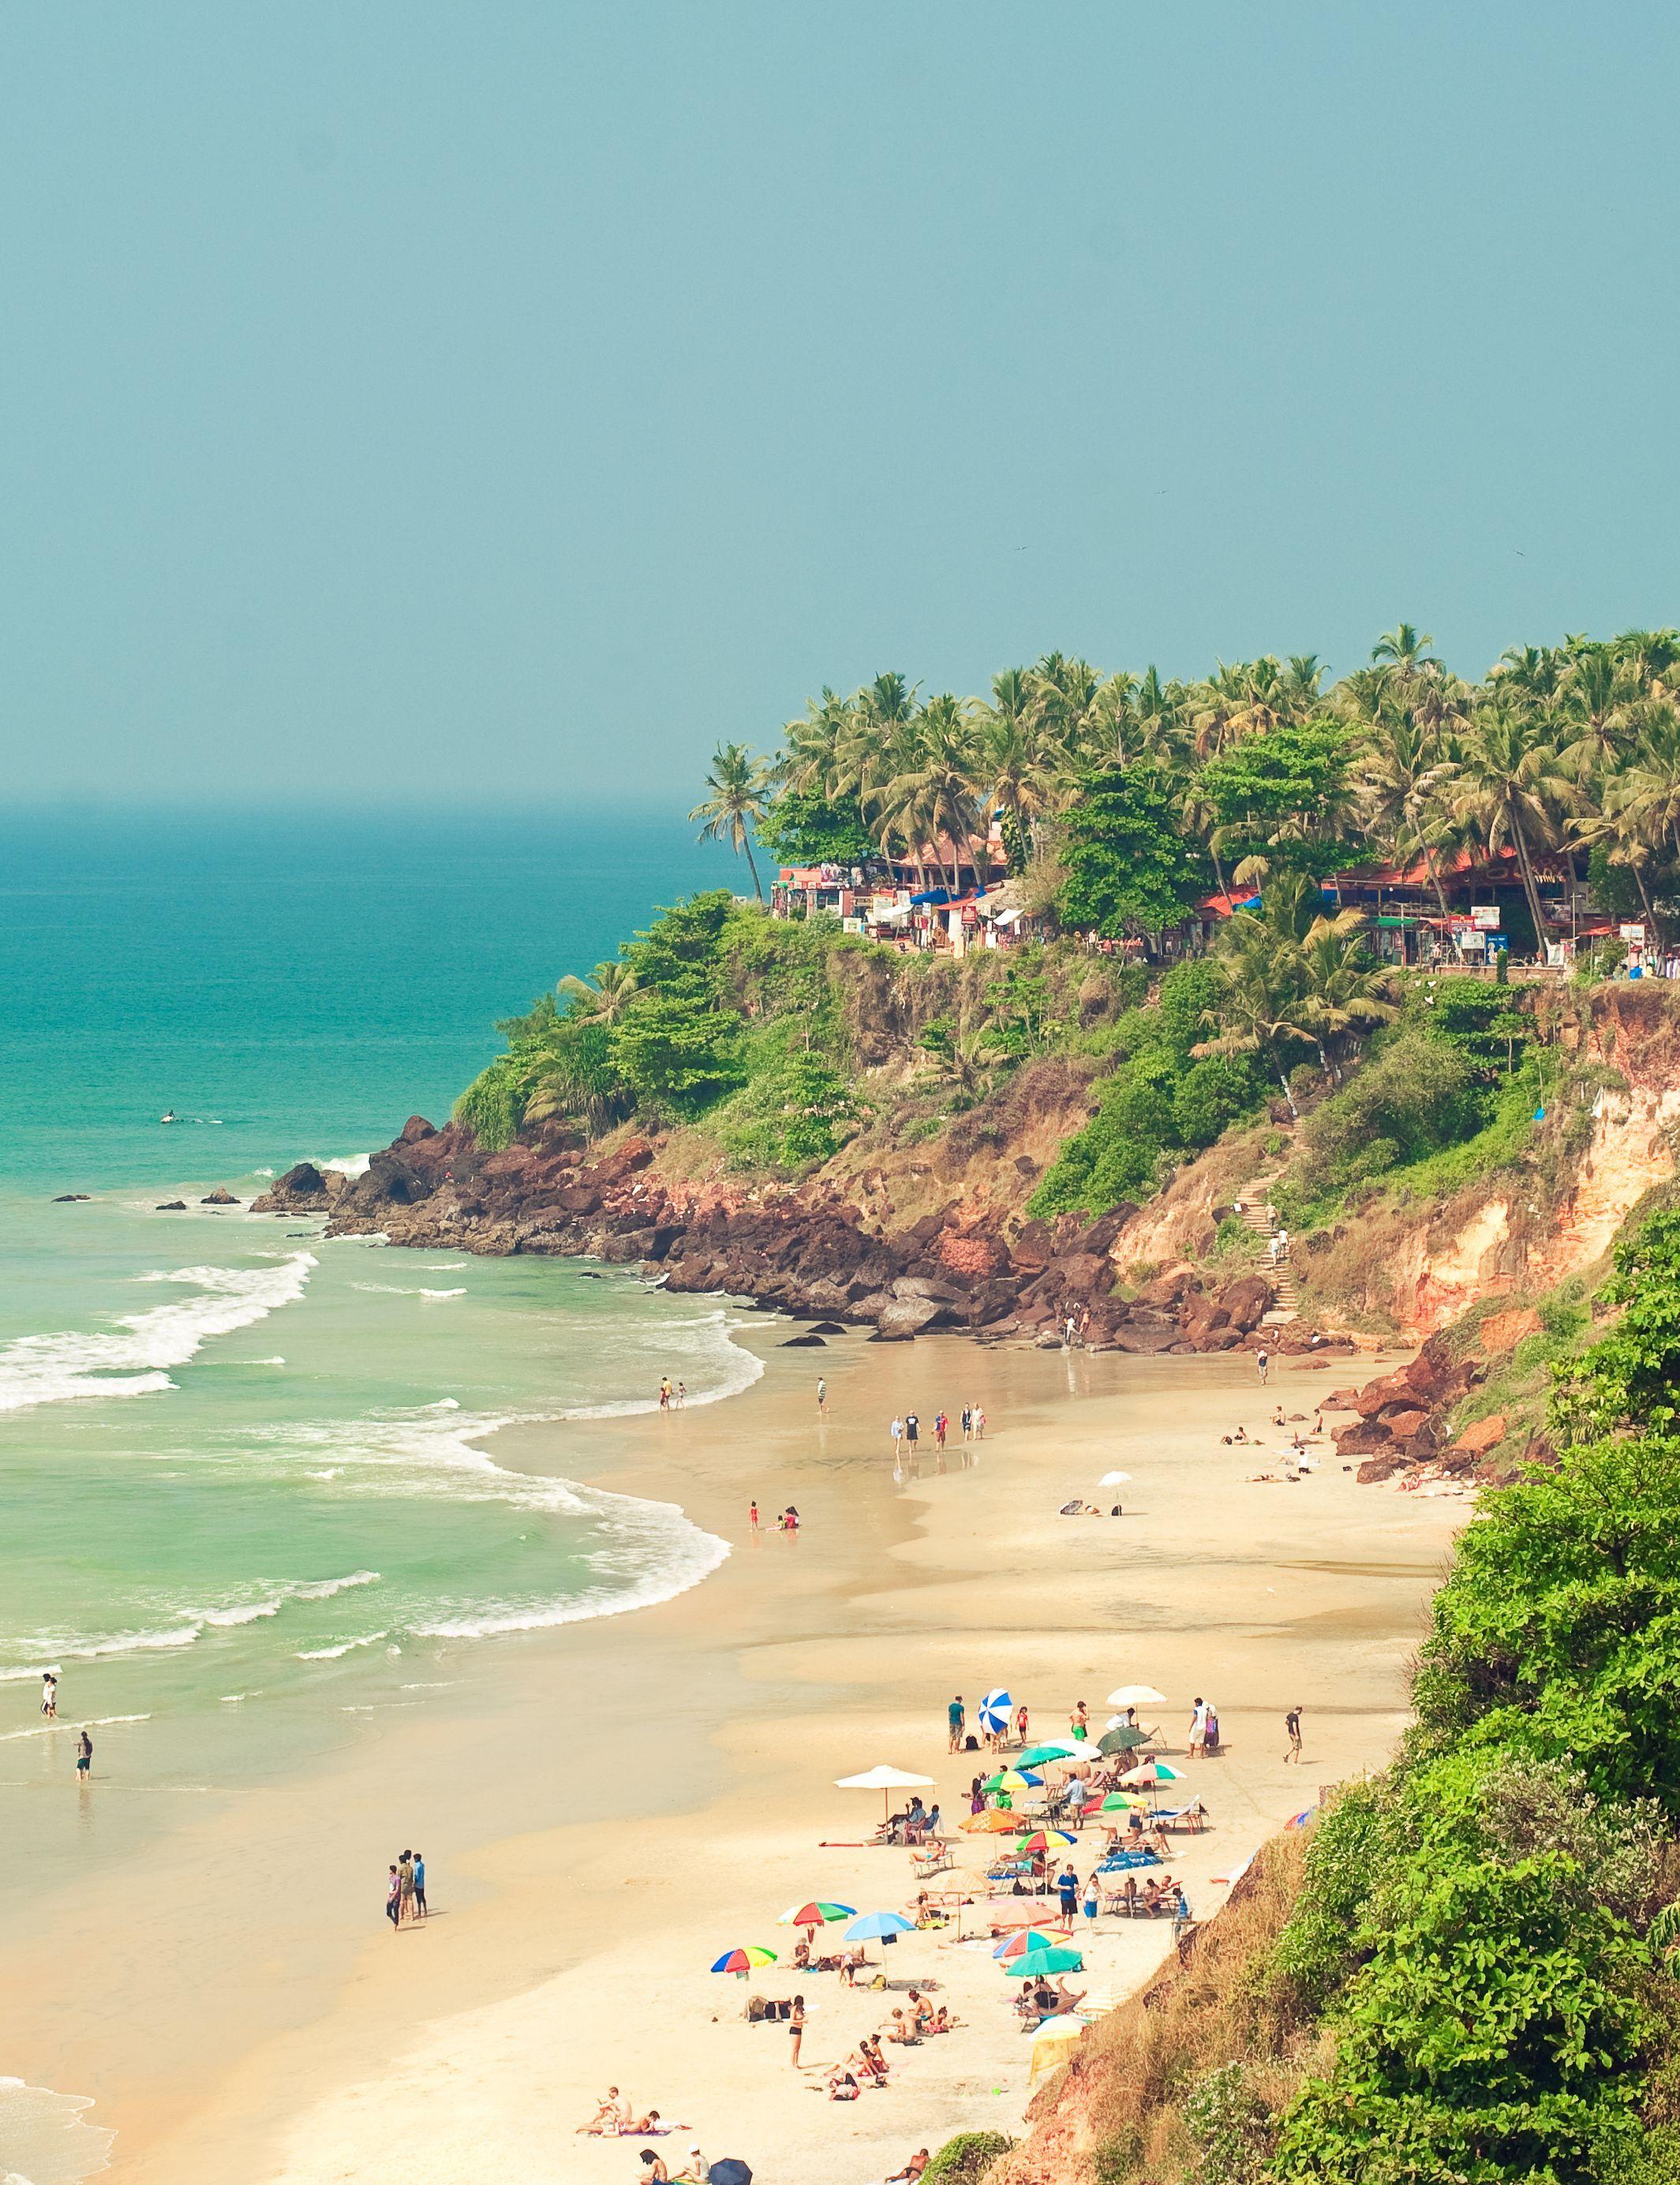 India, Goa, Palolem beach   India travel places, Goa ...